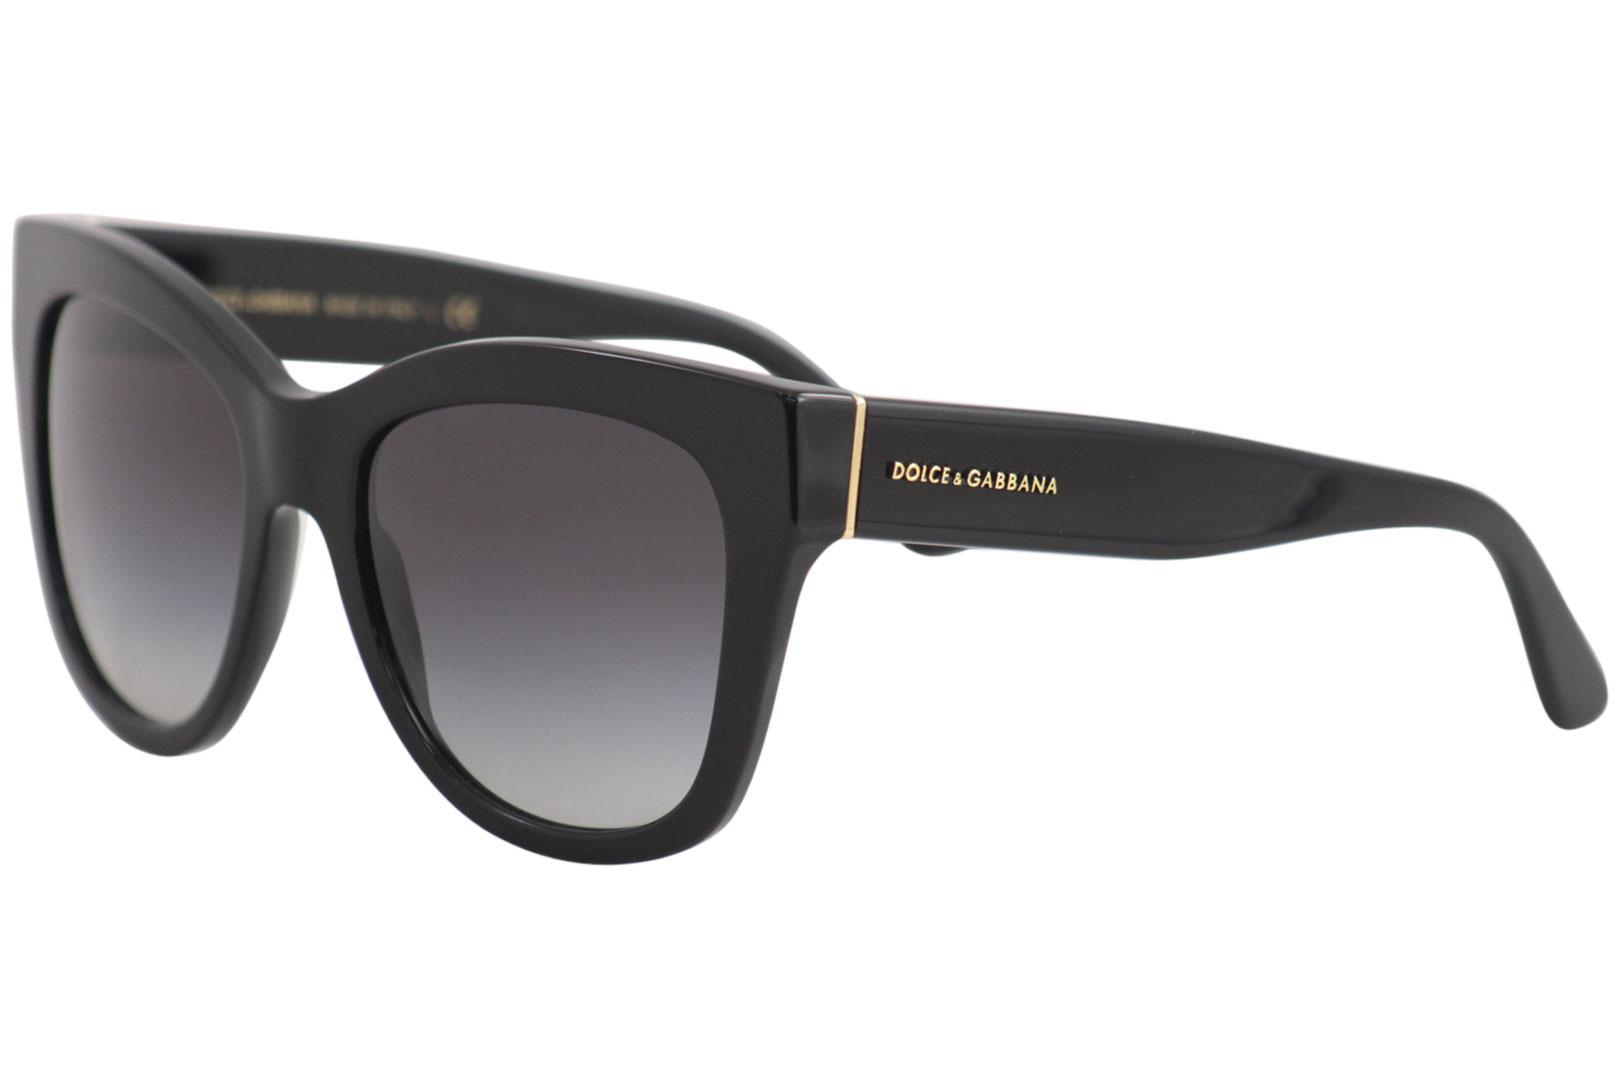 cd5f9a005cf Dolce   Gabbana Women s D G DG4270 DG 4270 Fashion Sunglasses